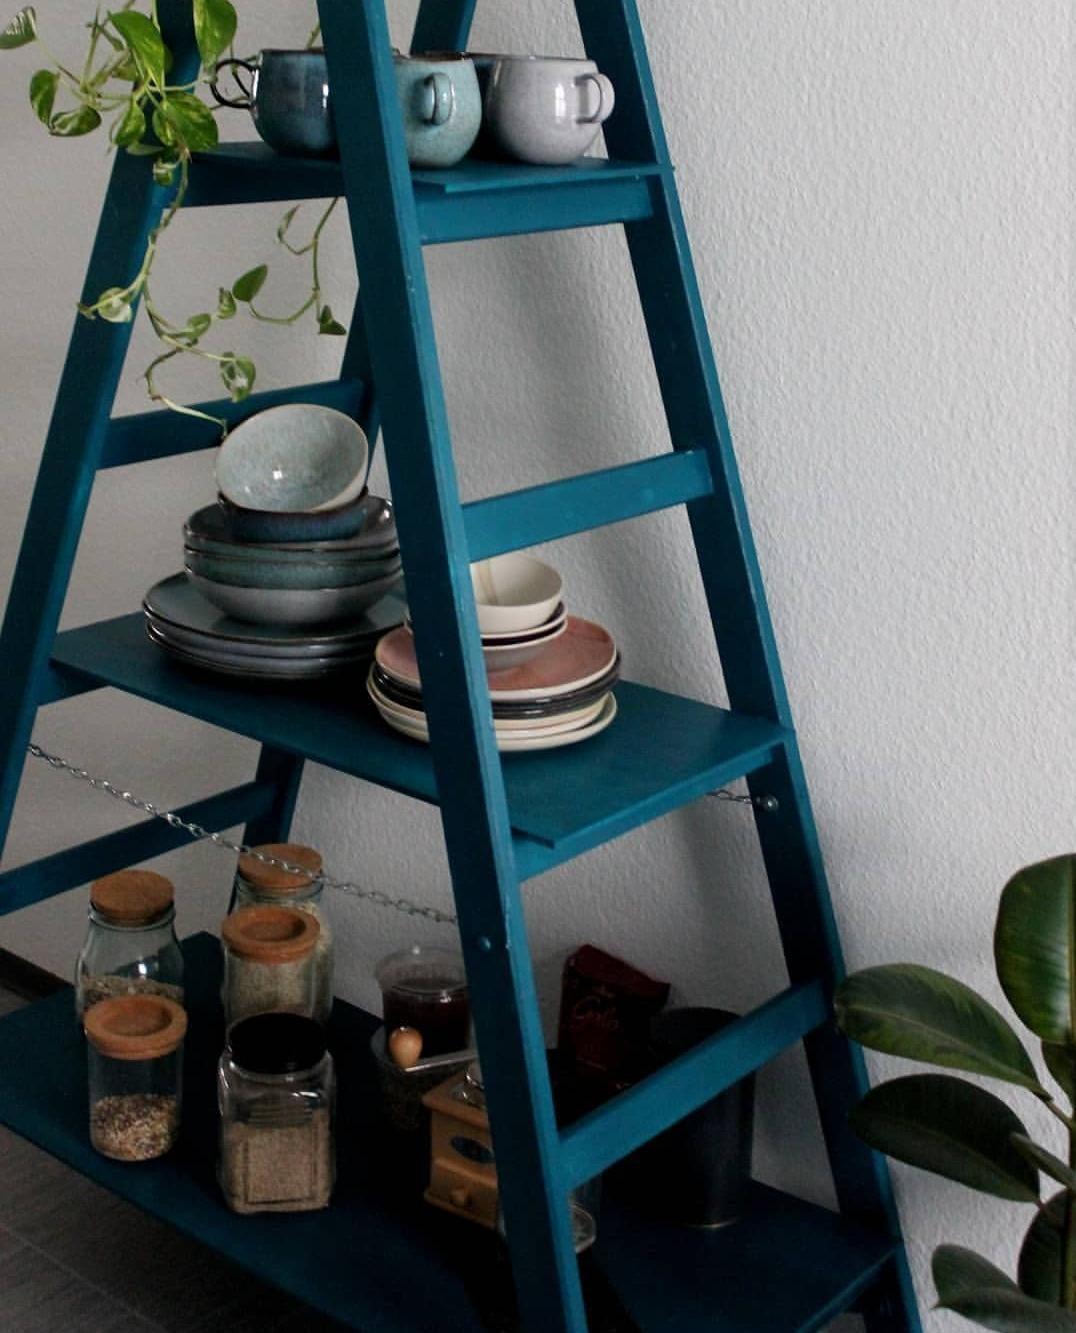 DIY Regal: Regale selber bauen • Bilder & Ideen • CO...